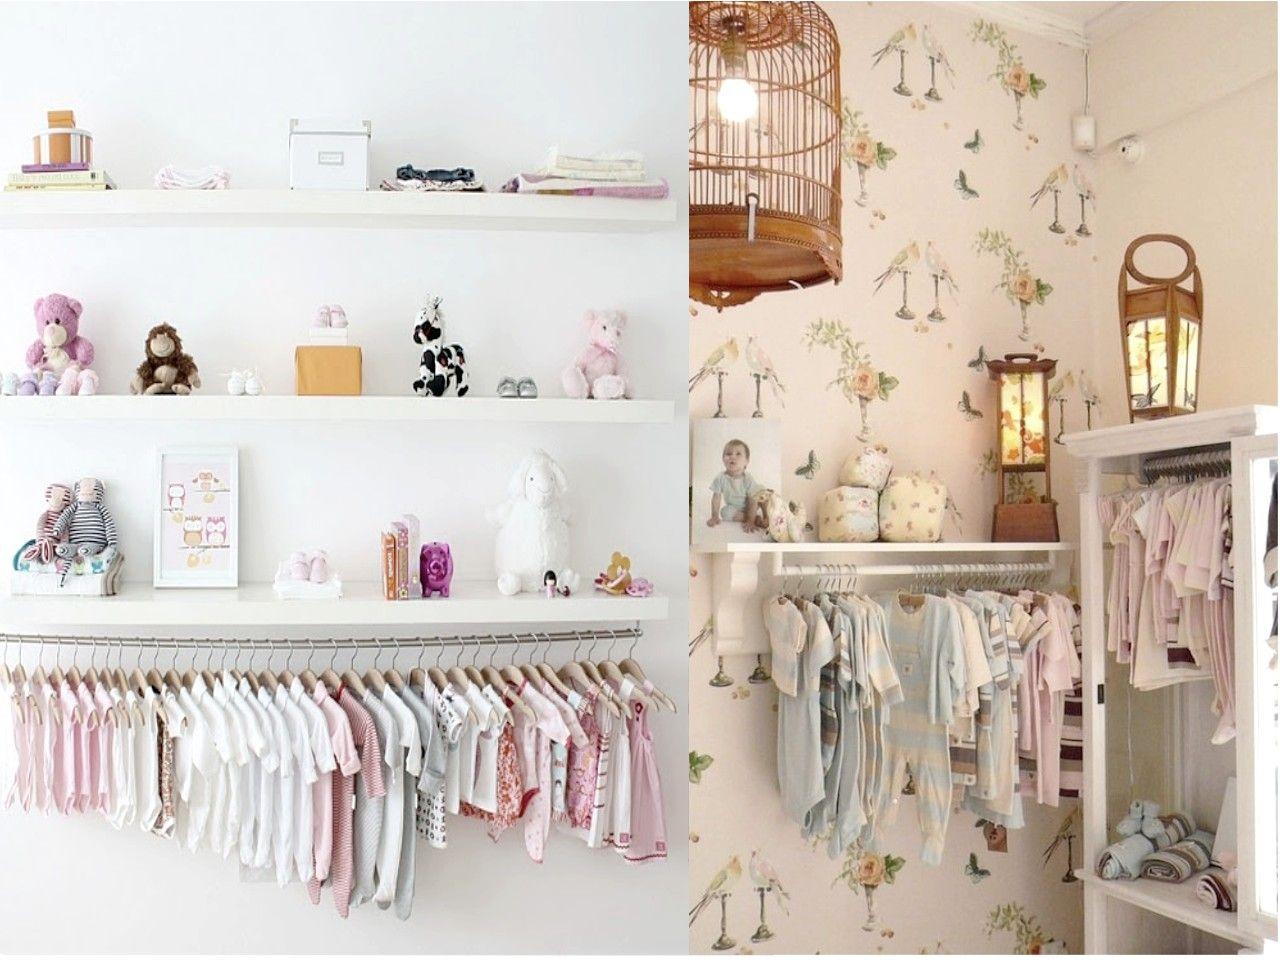 percheros bebé - Buscar con Google | Bebés | Pinterest | Perchero ...